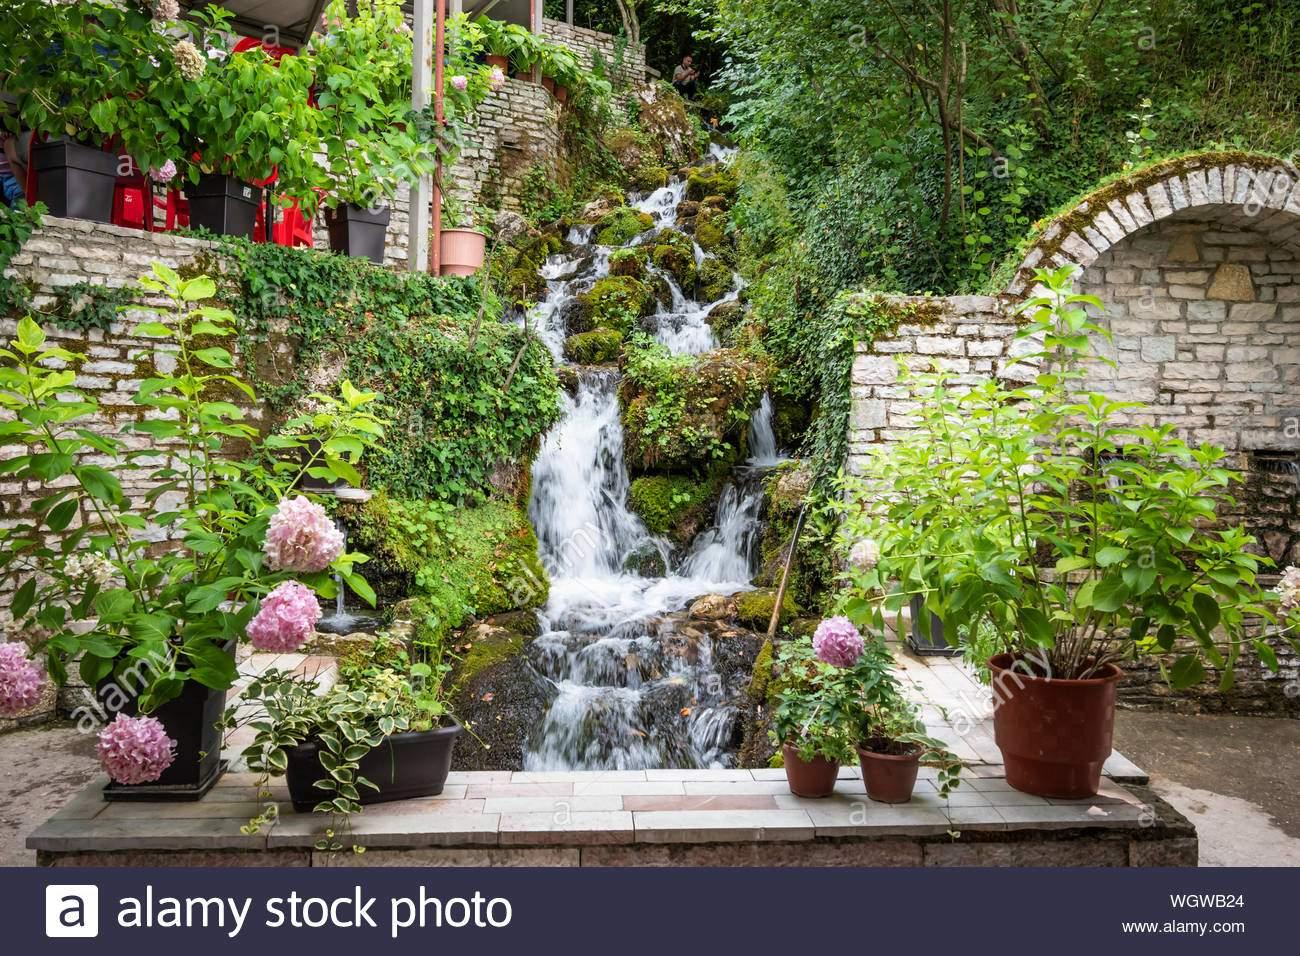 tepelena albanien juli 2019 das kalte wasser uje ich ftohte tepelene fruhjahr tepelena city wgwb24